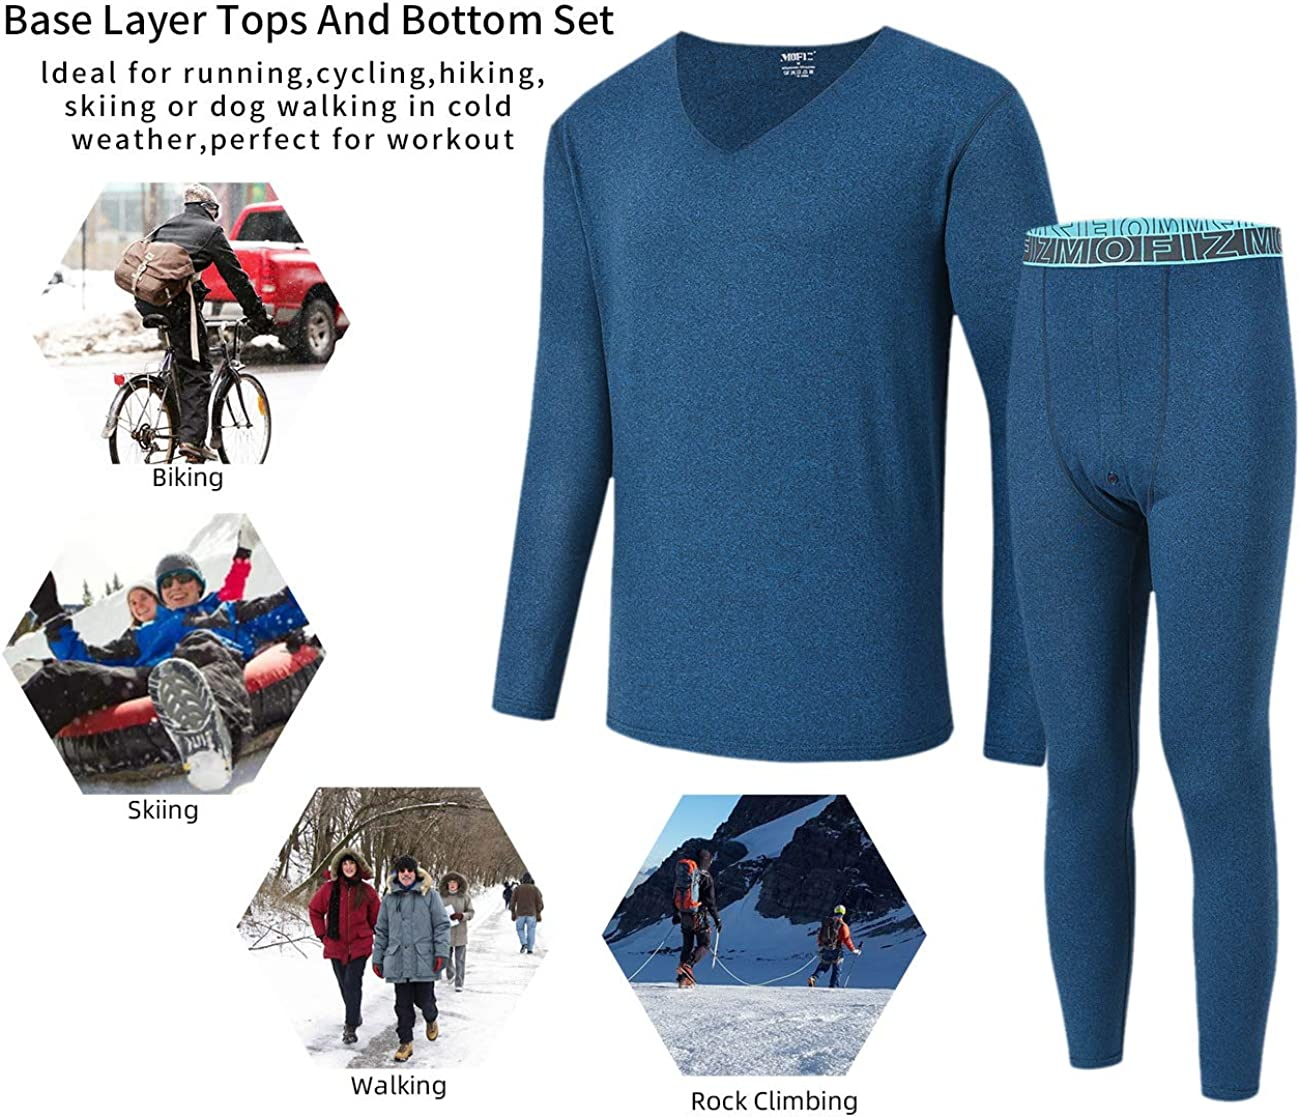 AIRIKE Mens Thermal Underwear Set Winter Long Johns Soft Base Layer